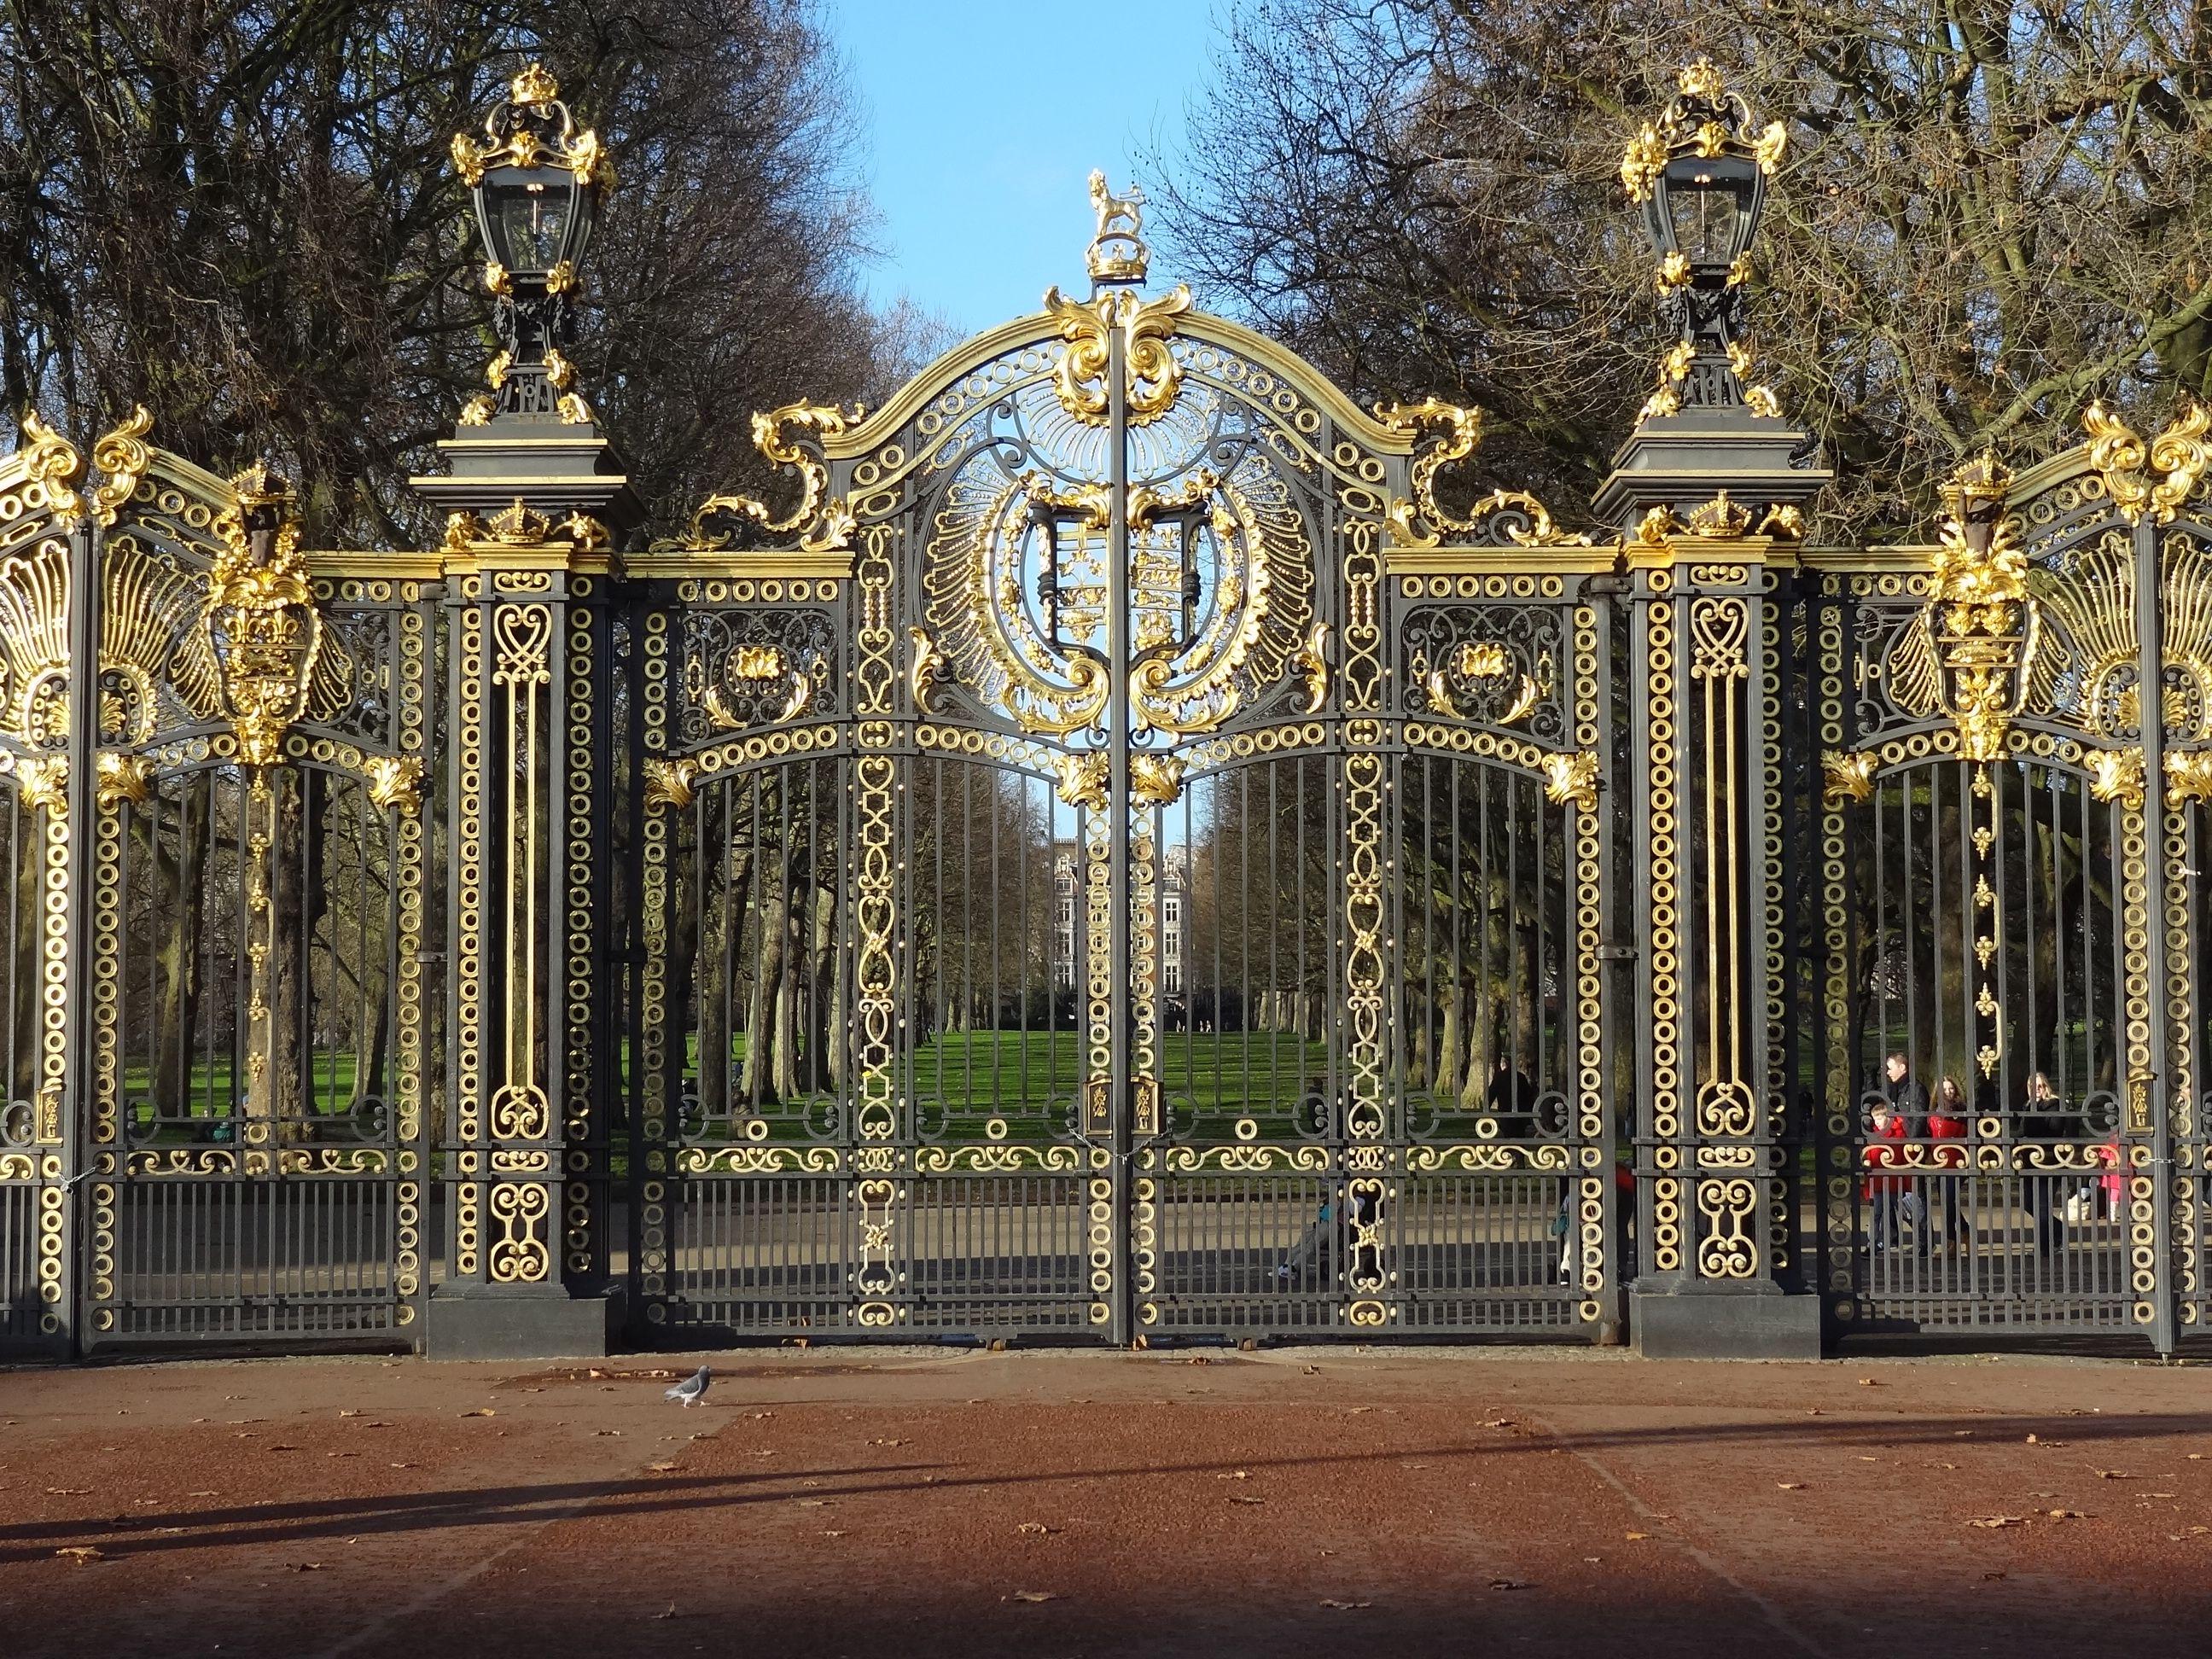 Canada Gate Green Park London АРьбом дРя ескізів